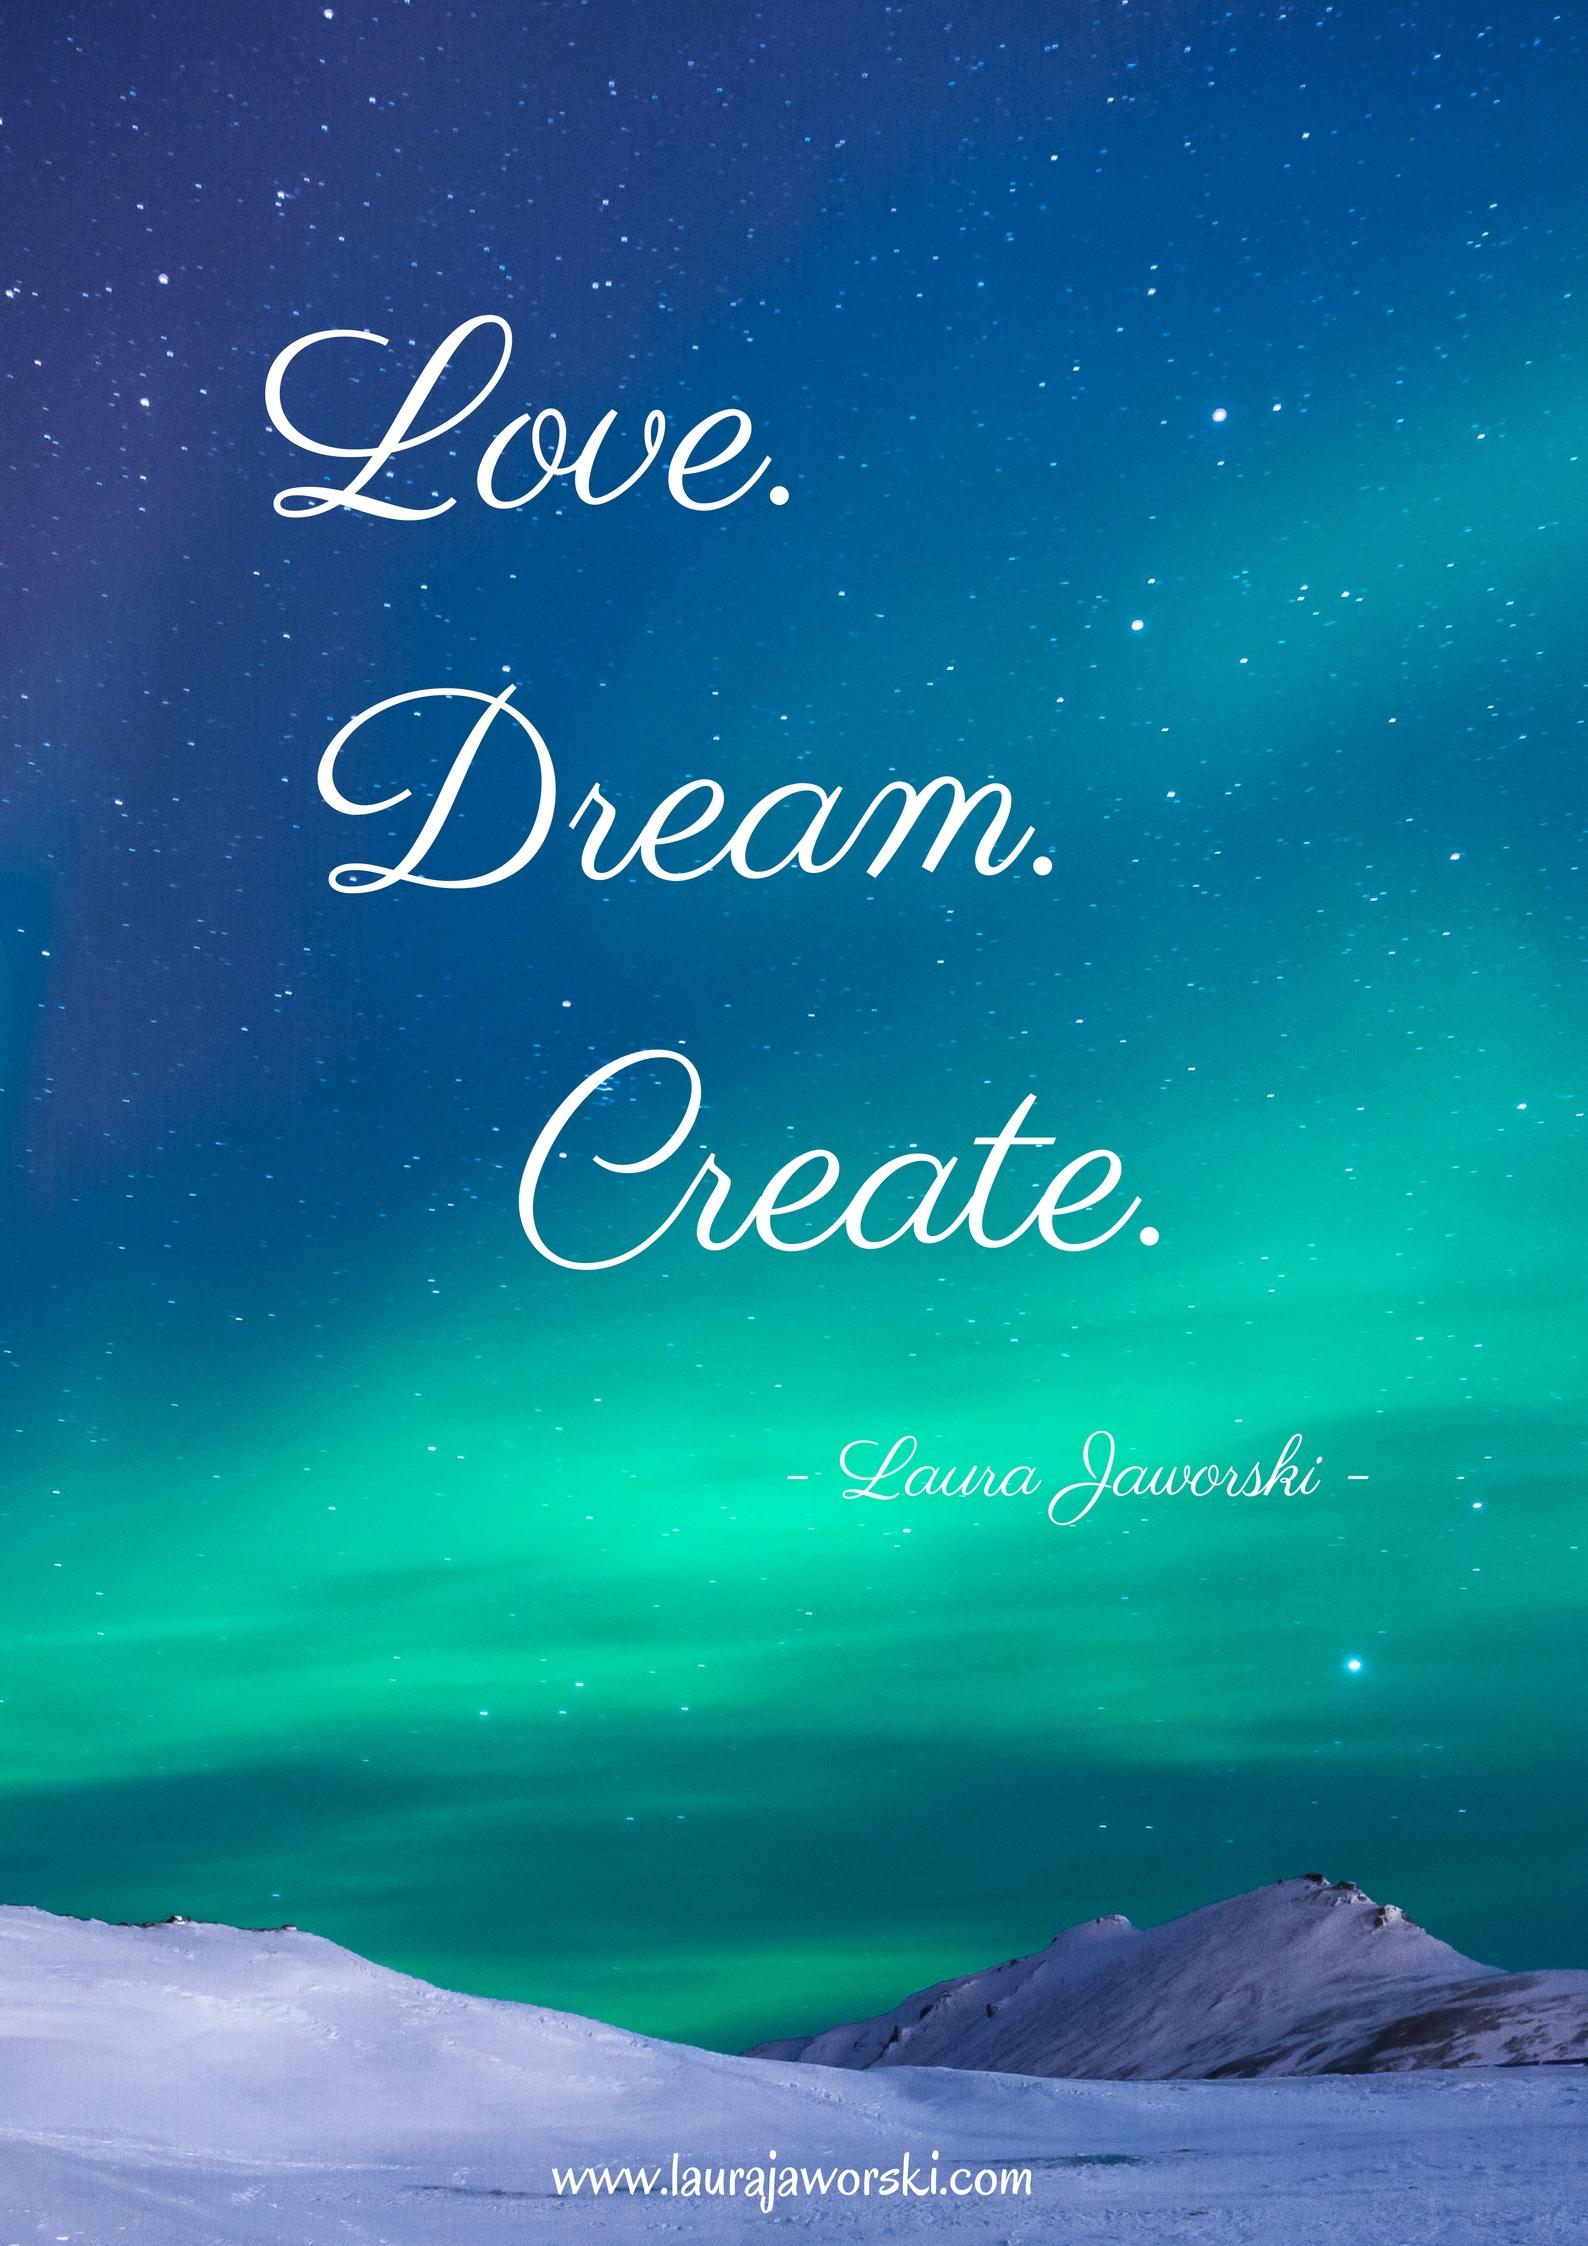 Create ♥ | www.laurajaworski.com